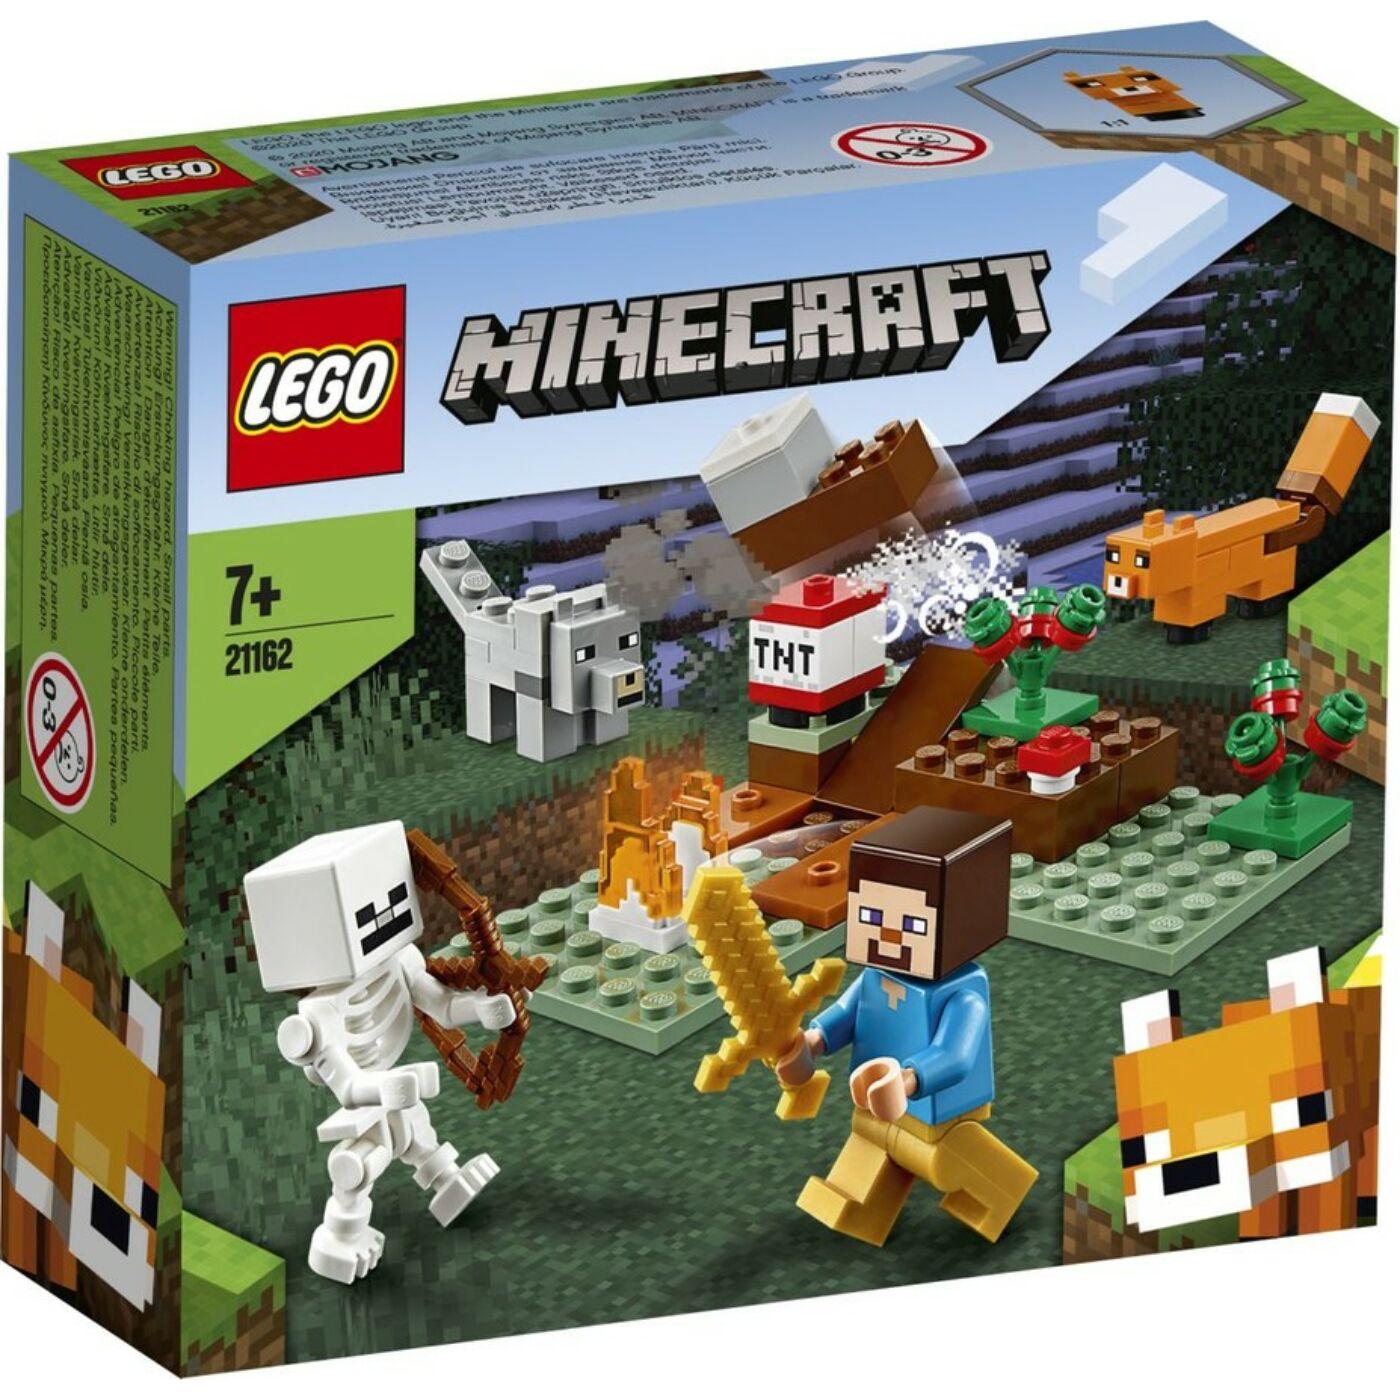 Lego Minecraft A tajgai kaland